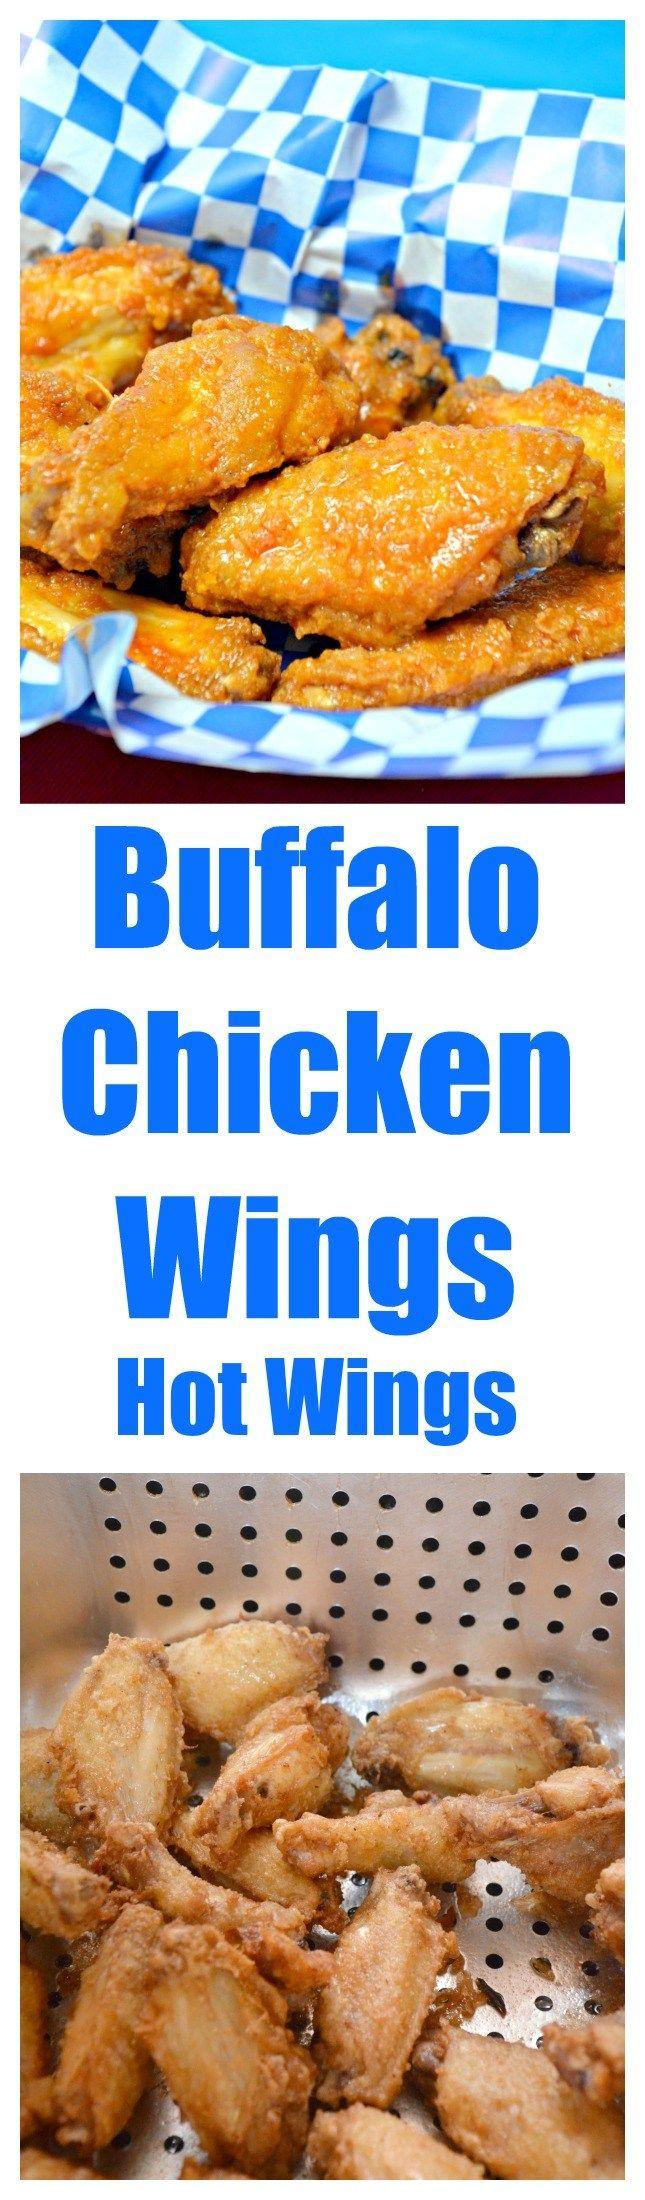 Crispy Fried Buffalo Chicken Wings with Garlic Hot Sauce #wings #hotwings #buffalowings #Superbowl #appetizer #chicken #football food SEE RECIPE HERE: http://recipesforourdailybread.com/buffalo-chicken-wings/